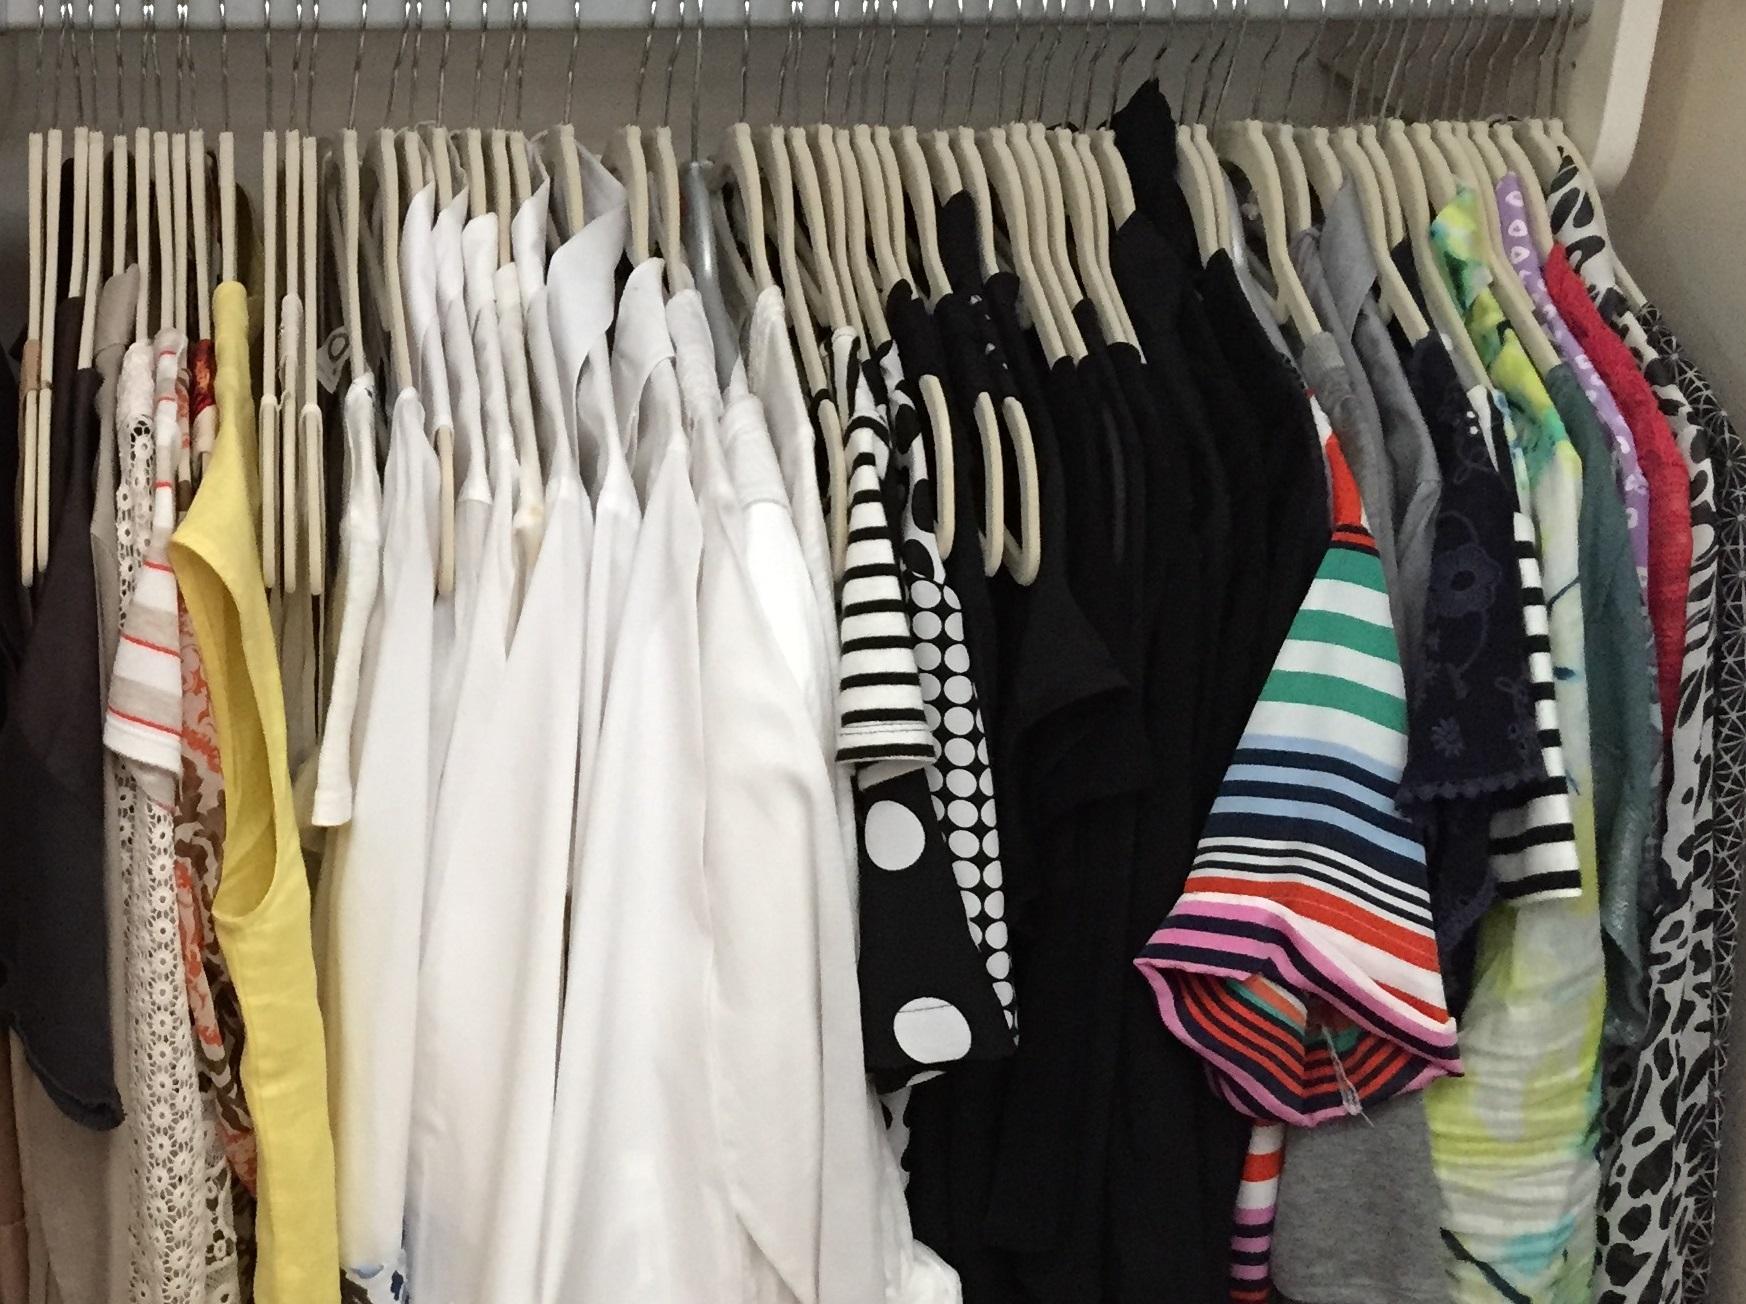 Closet Organzing 123 Organize